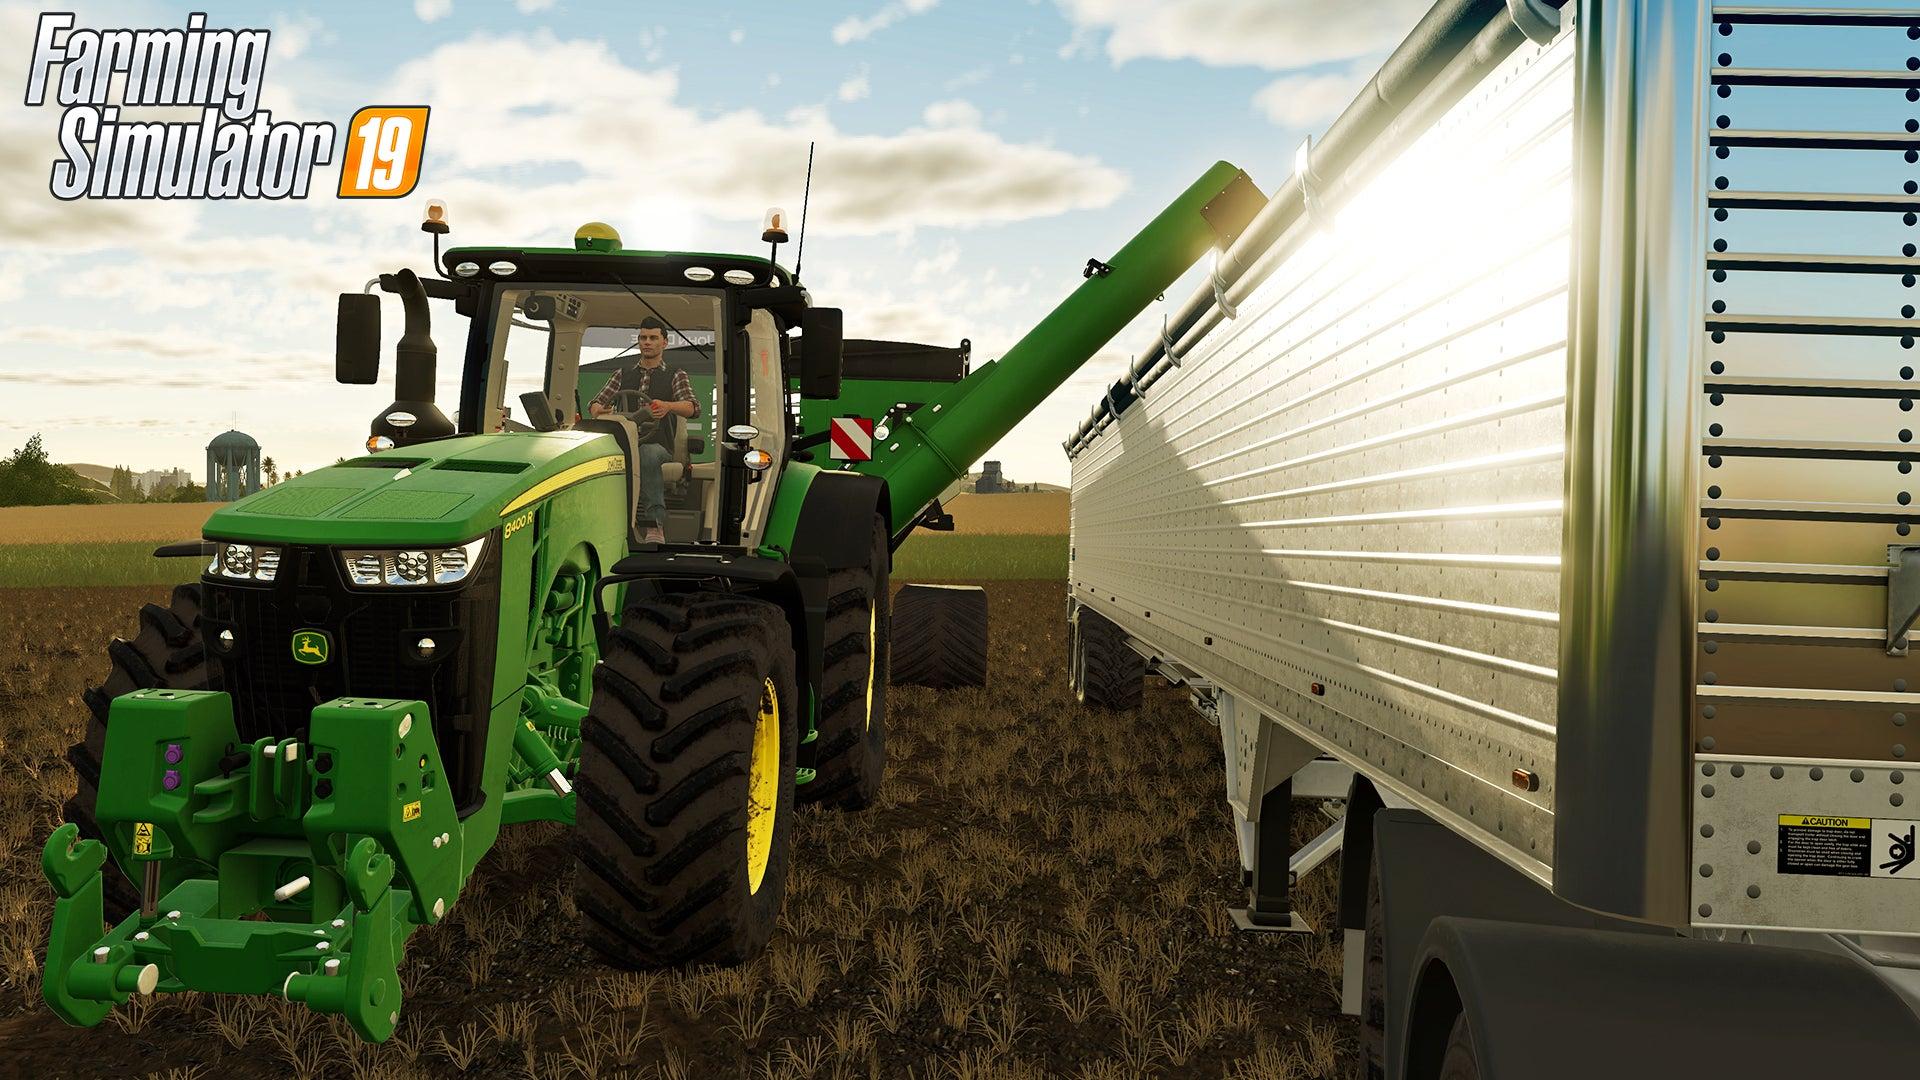 Image for Farming Simulator 19 money cheat